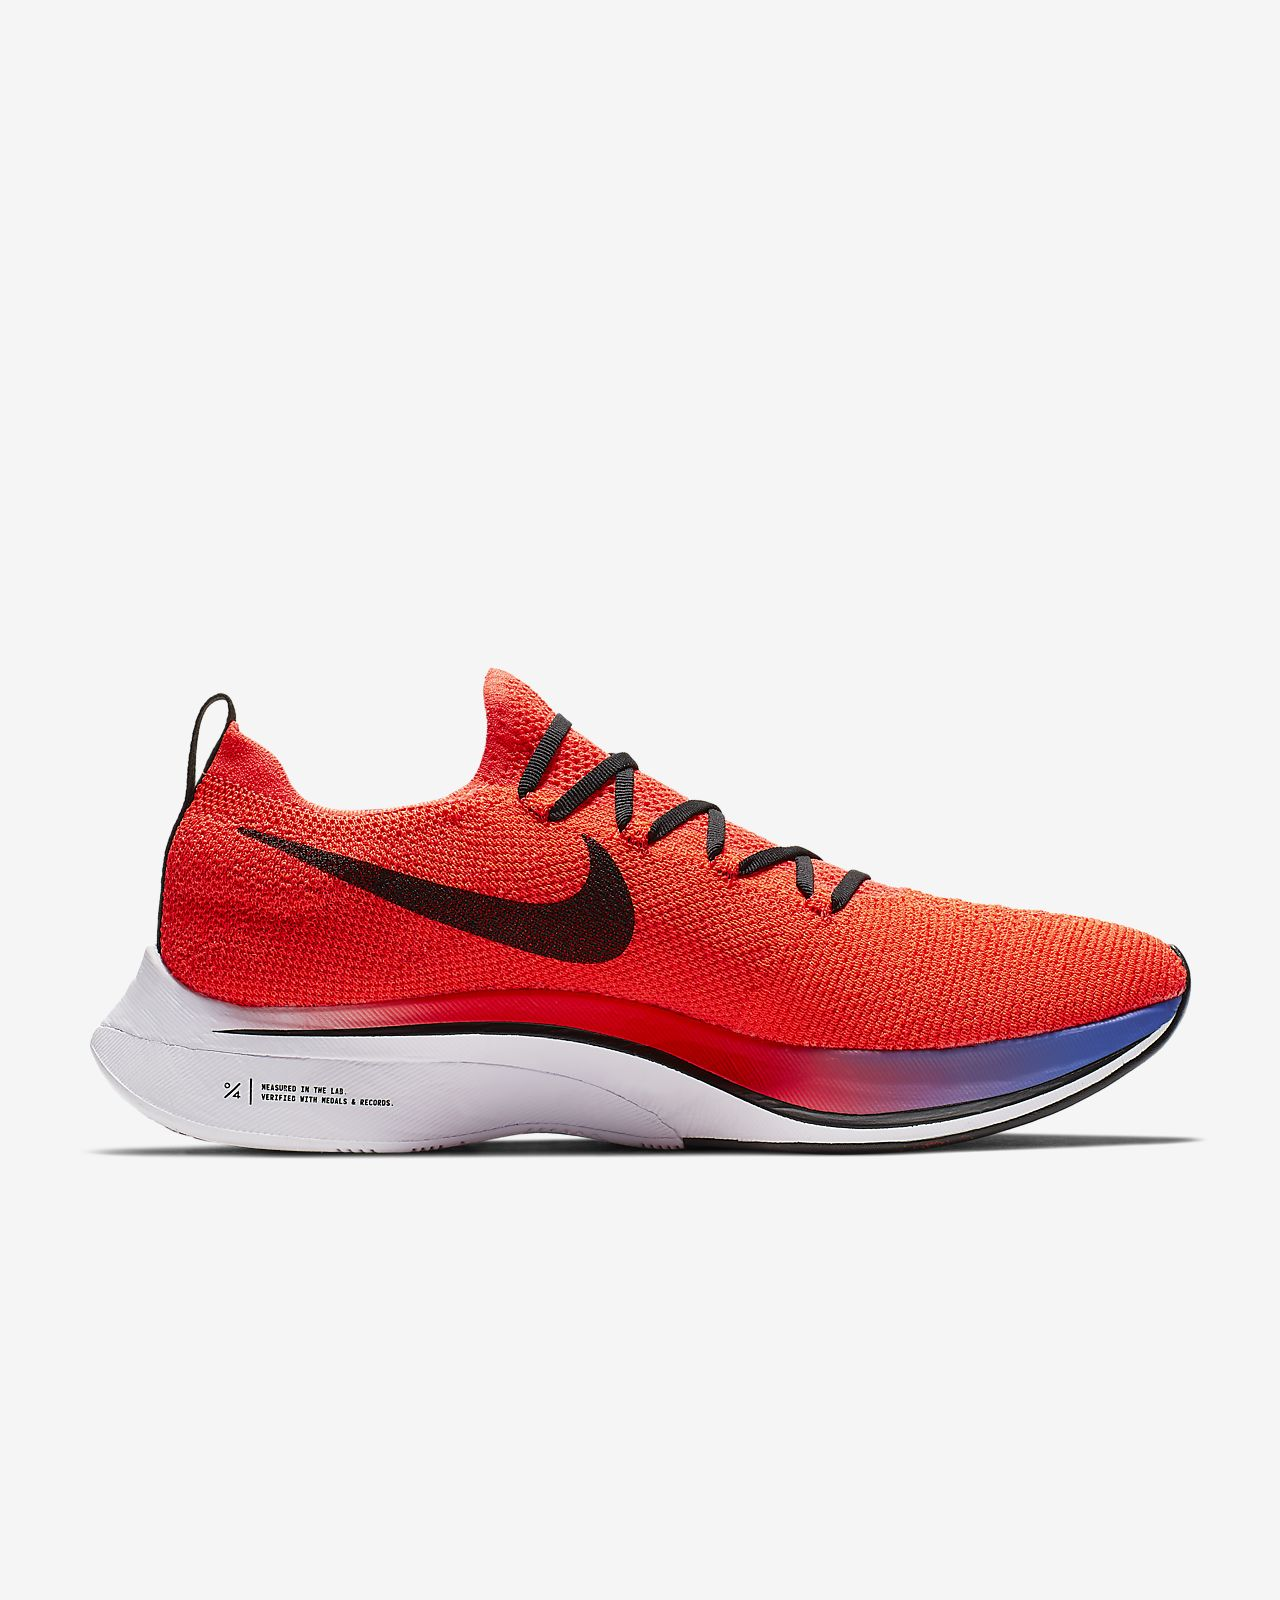 Nike De Running Chaussure Vaporfly 4FlyknitFr WEQerxBodC